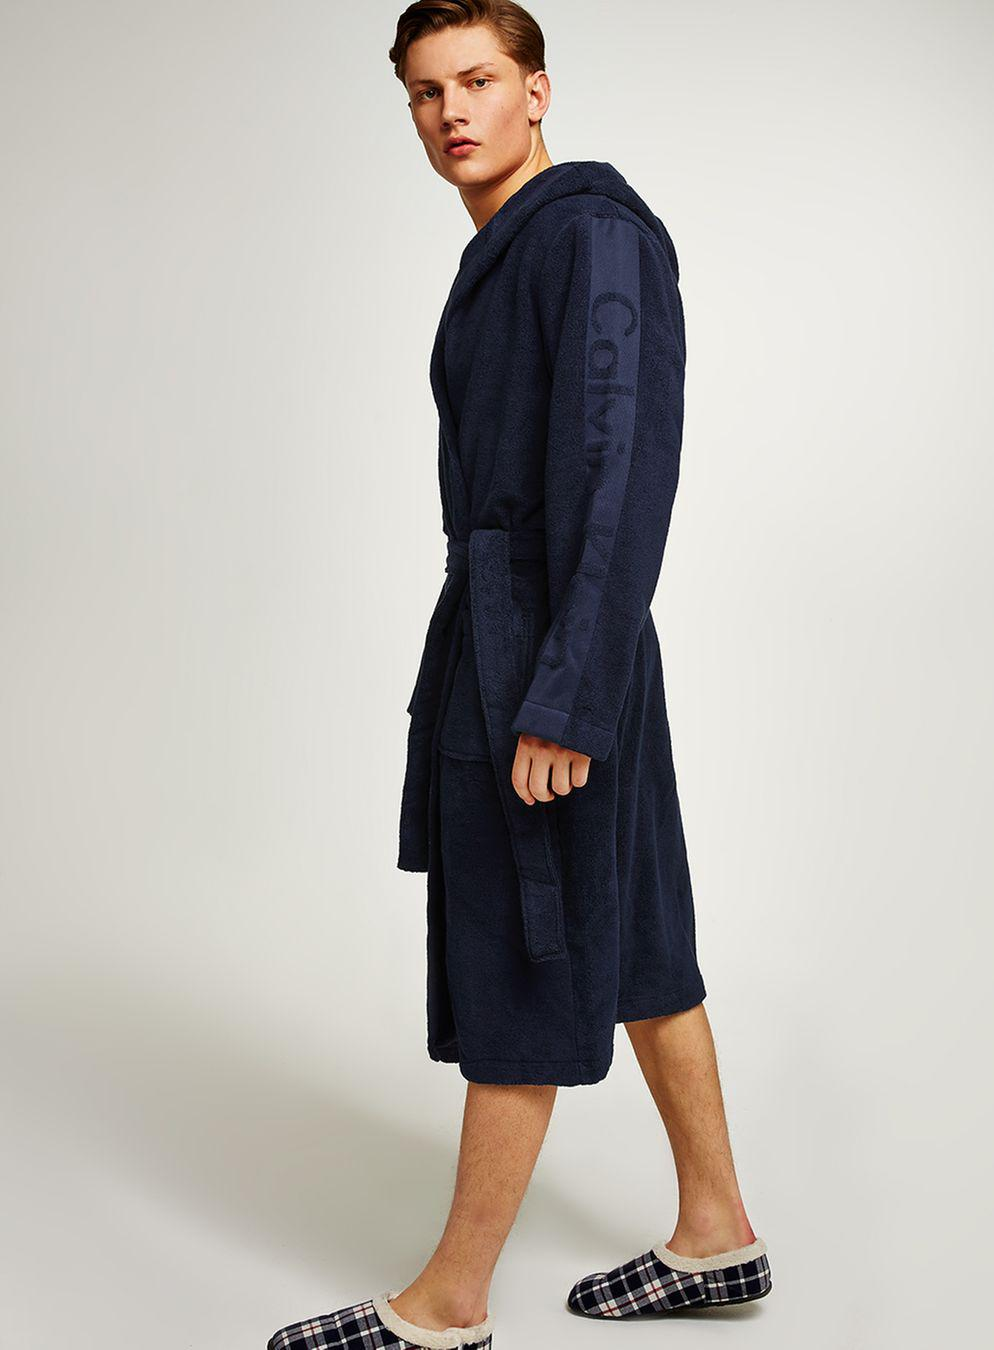 Topman Calvin Klein Navy Cotton Dressing Gown in Blue for Men - Lyst